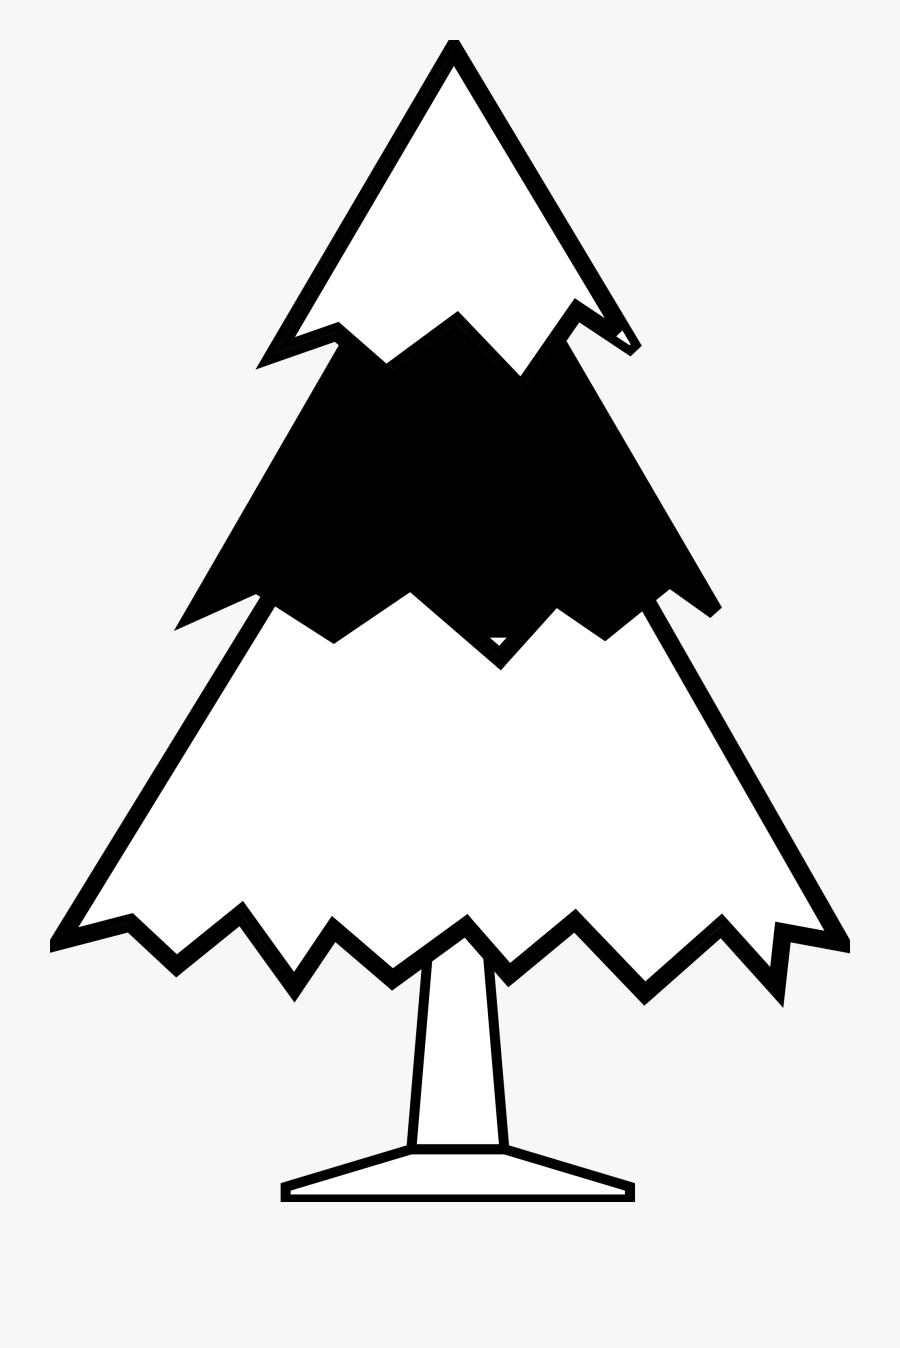 Tree Black And White Free Christmas Tree Clipart - Christmas Tree Clipart Drawing, Transparent Clipart